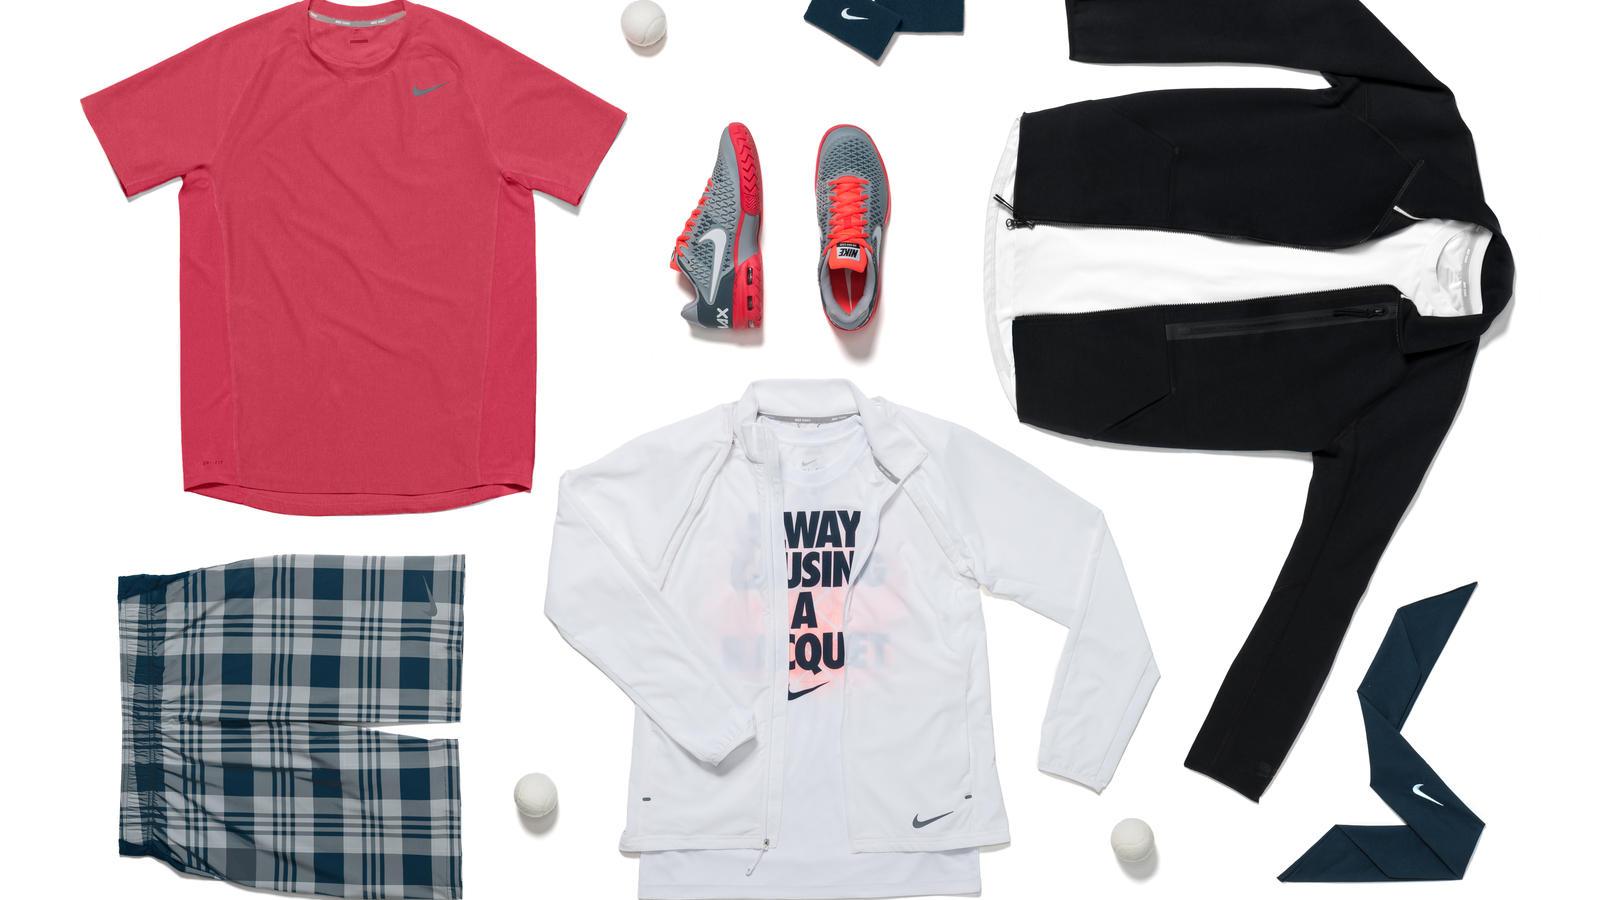 Nike Tennis Juan Martin - NYC 2013